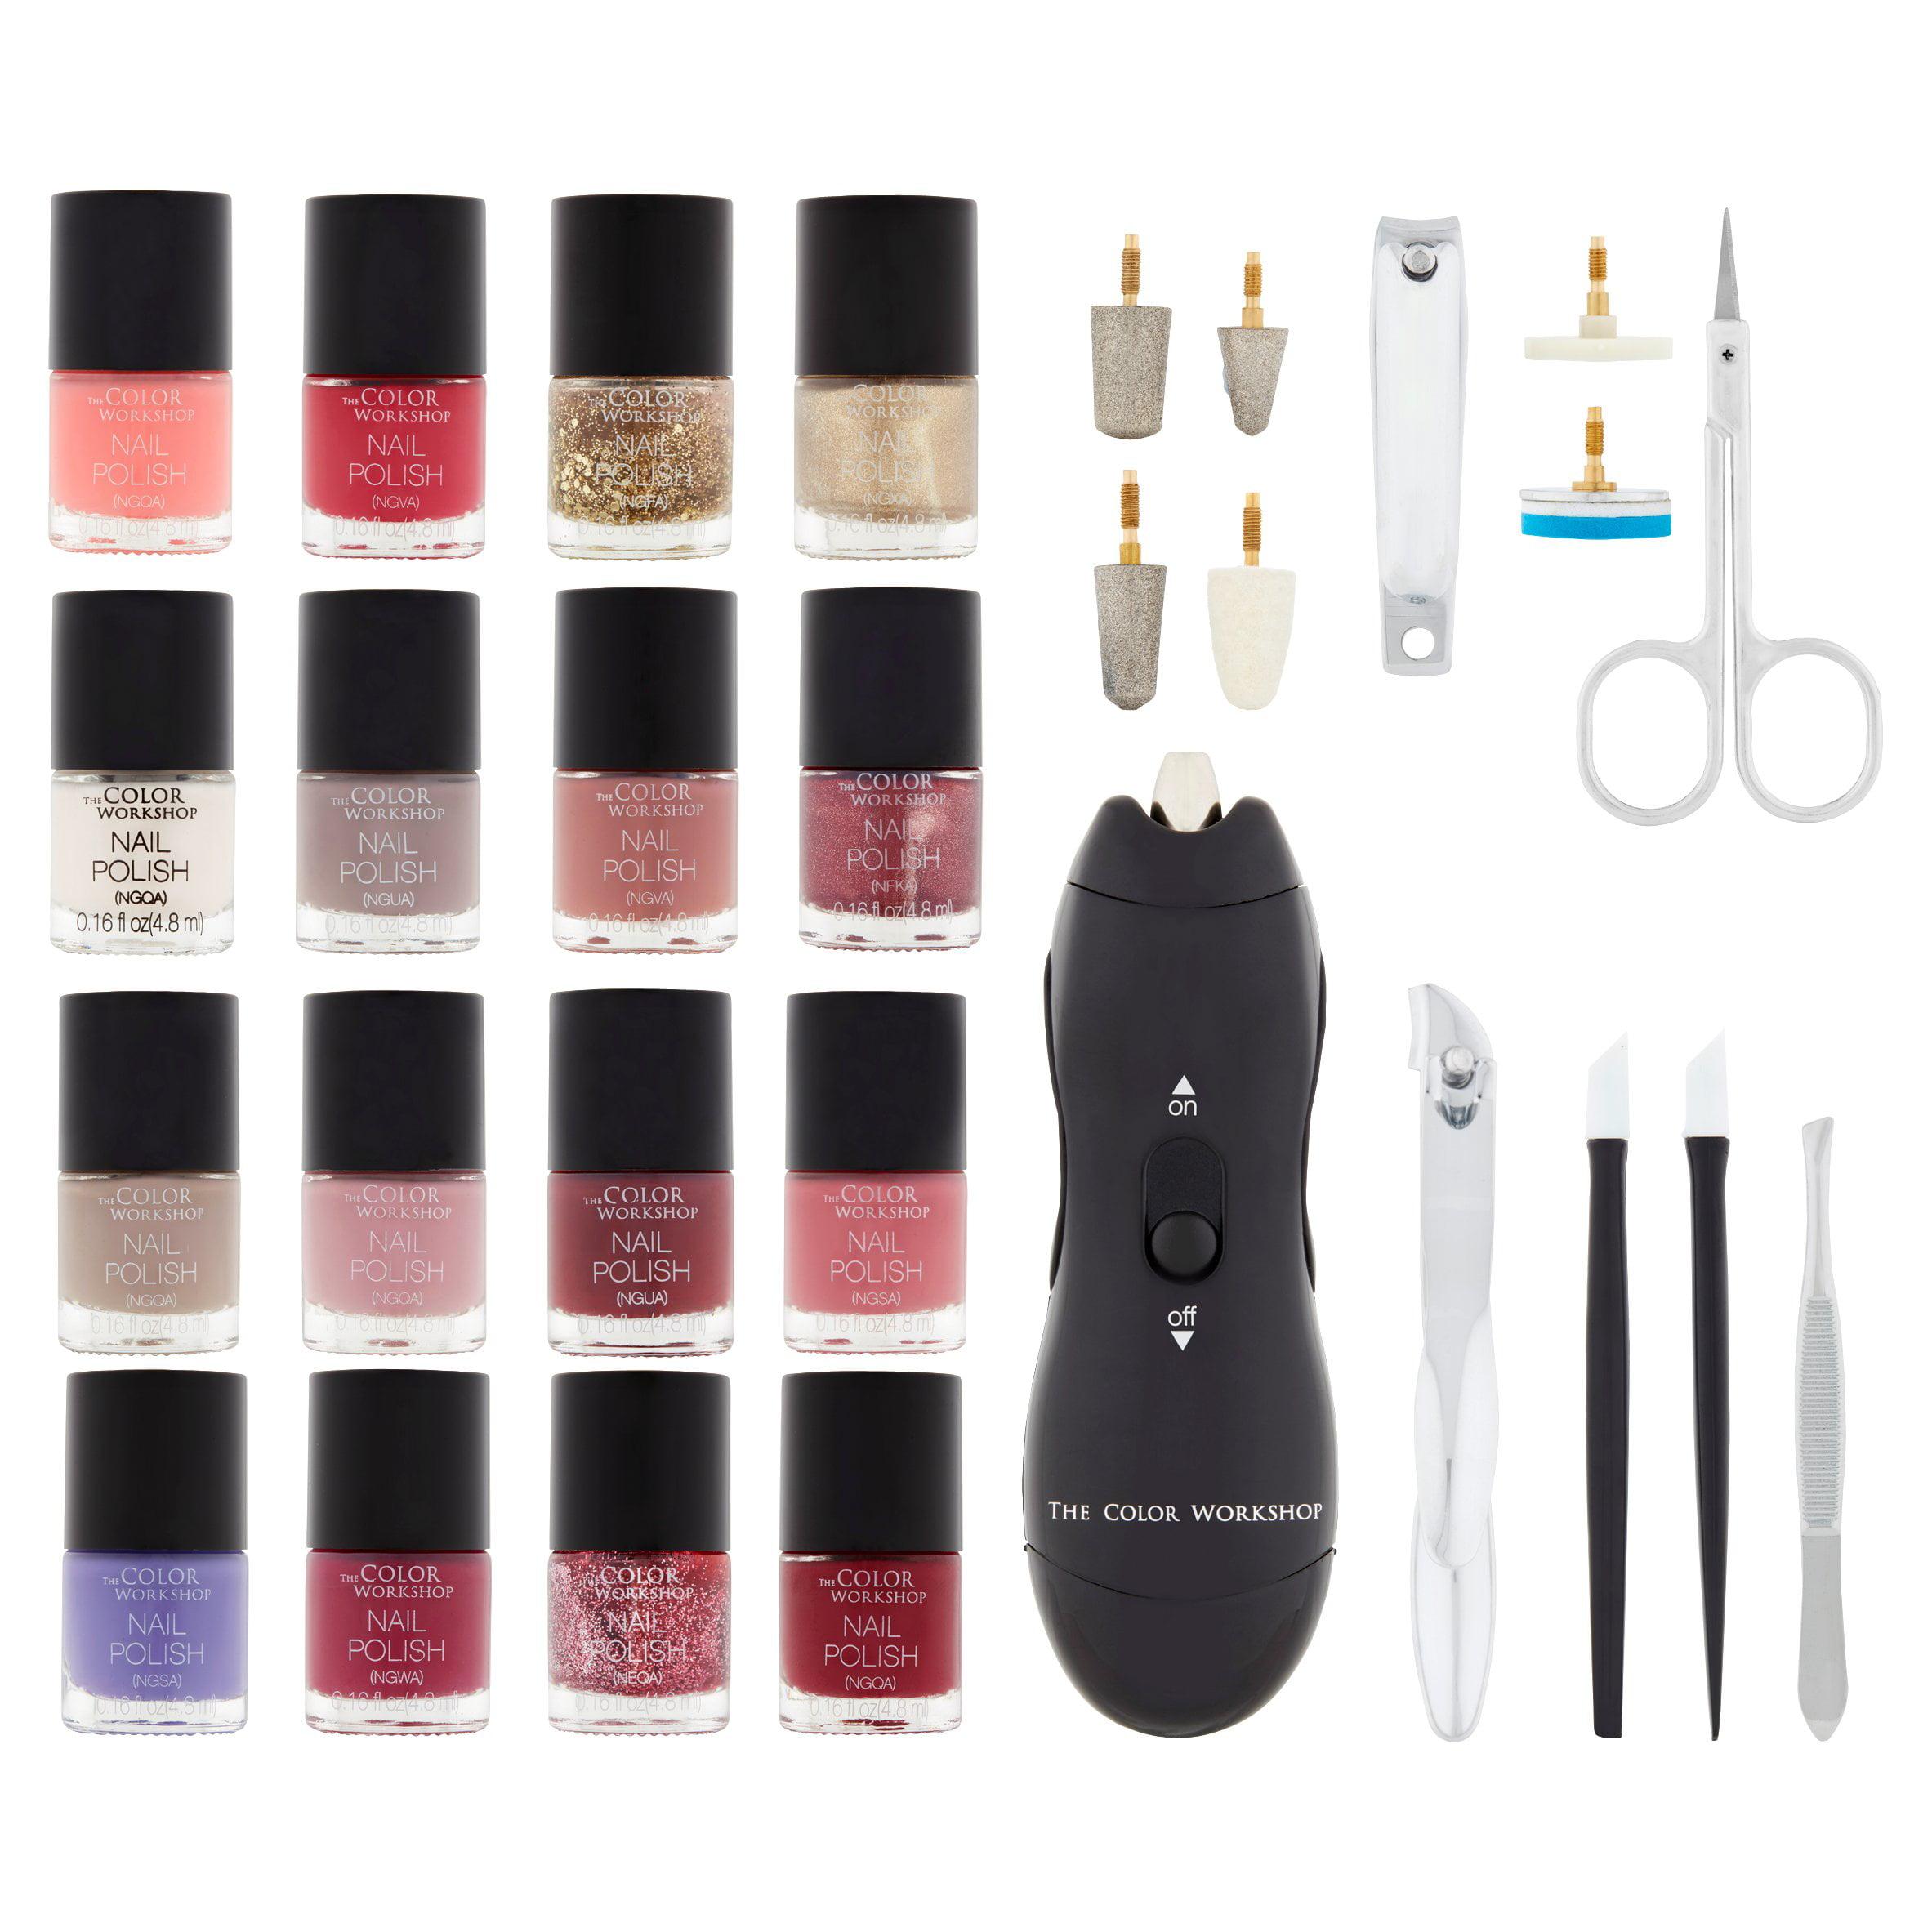 The Color Workshop Incredible Nails Nail Polish Salon Gift Set 30 Piece - Walmart.com